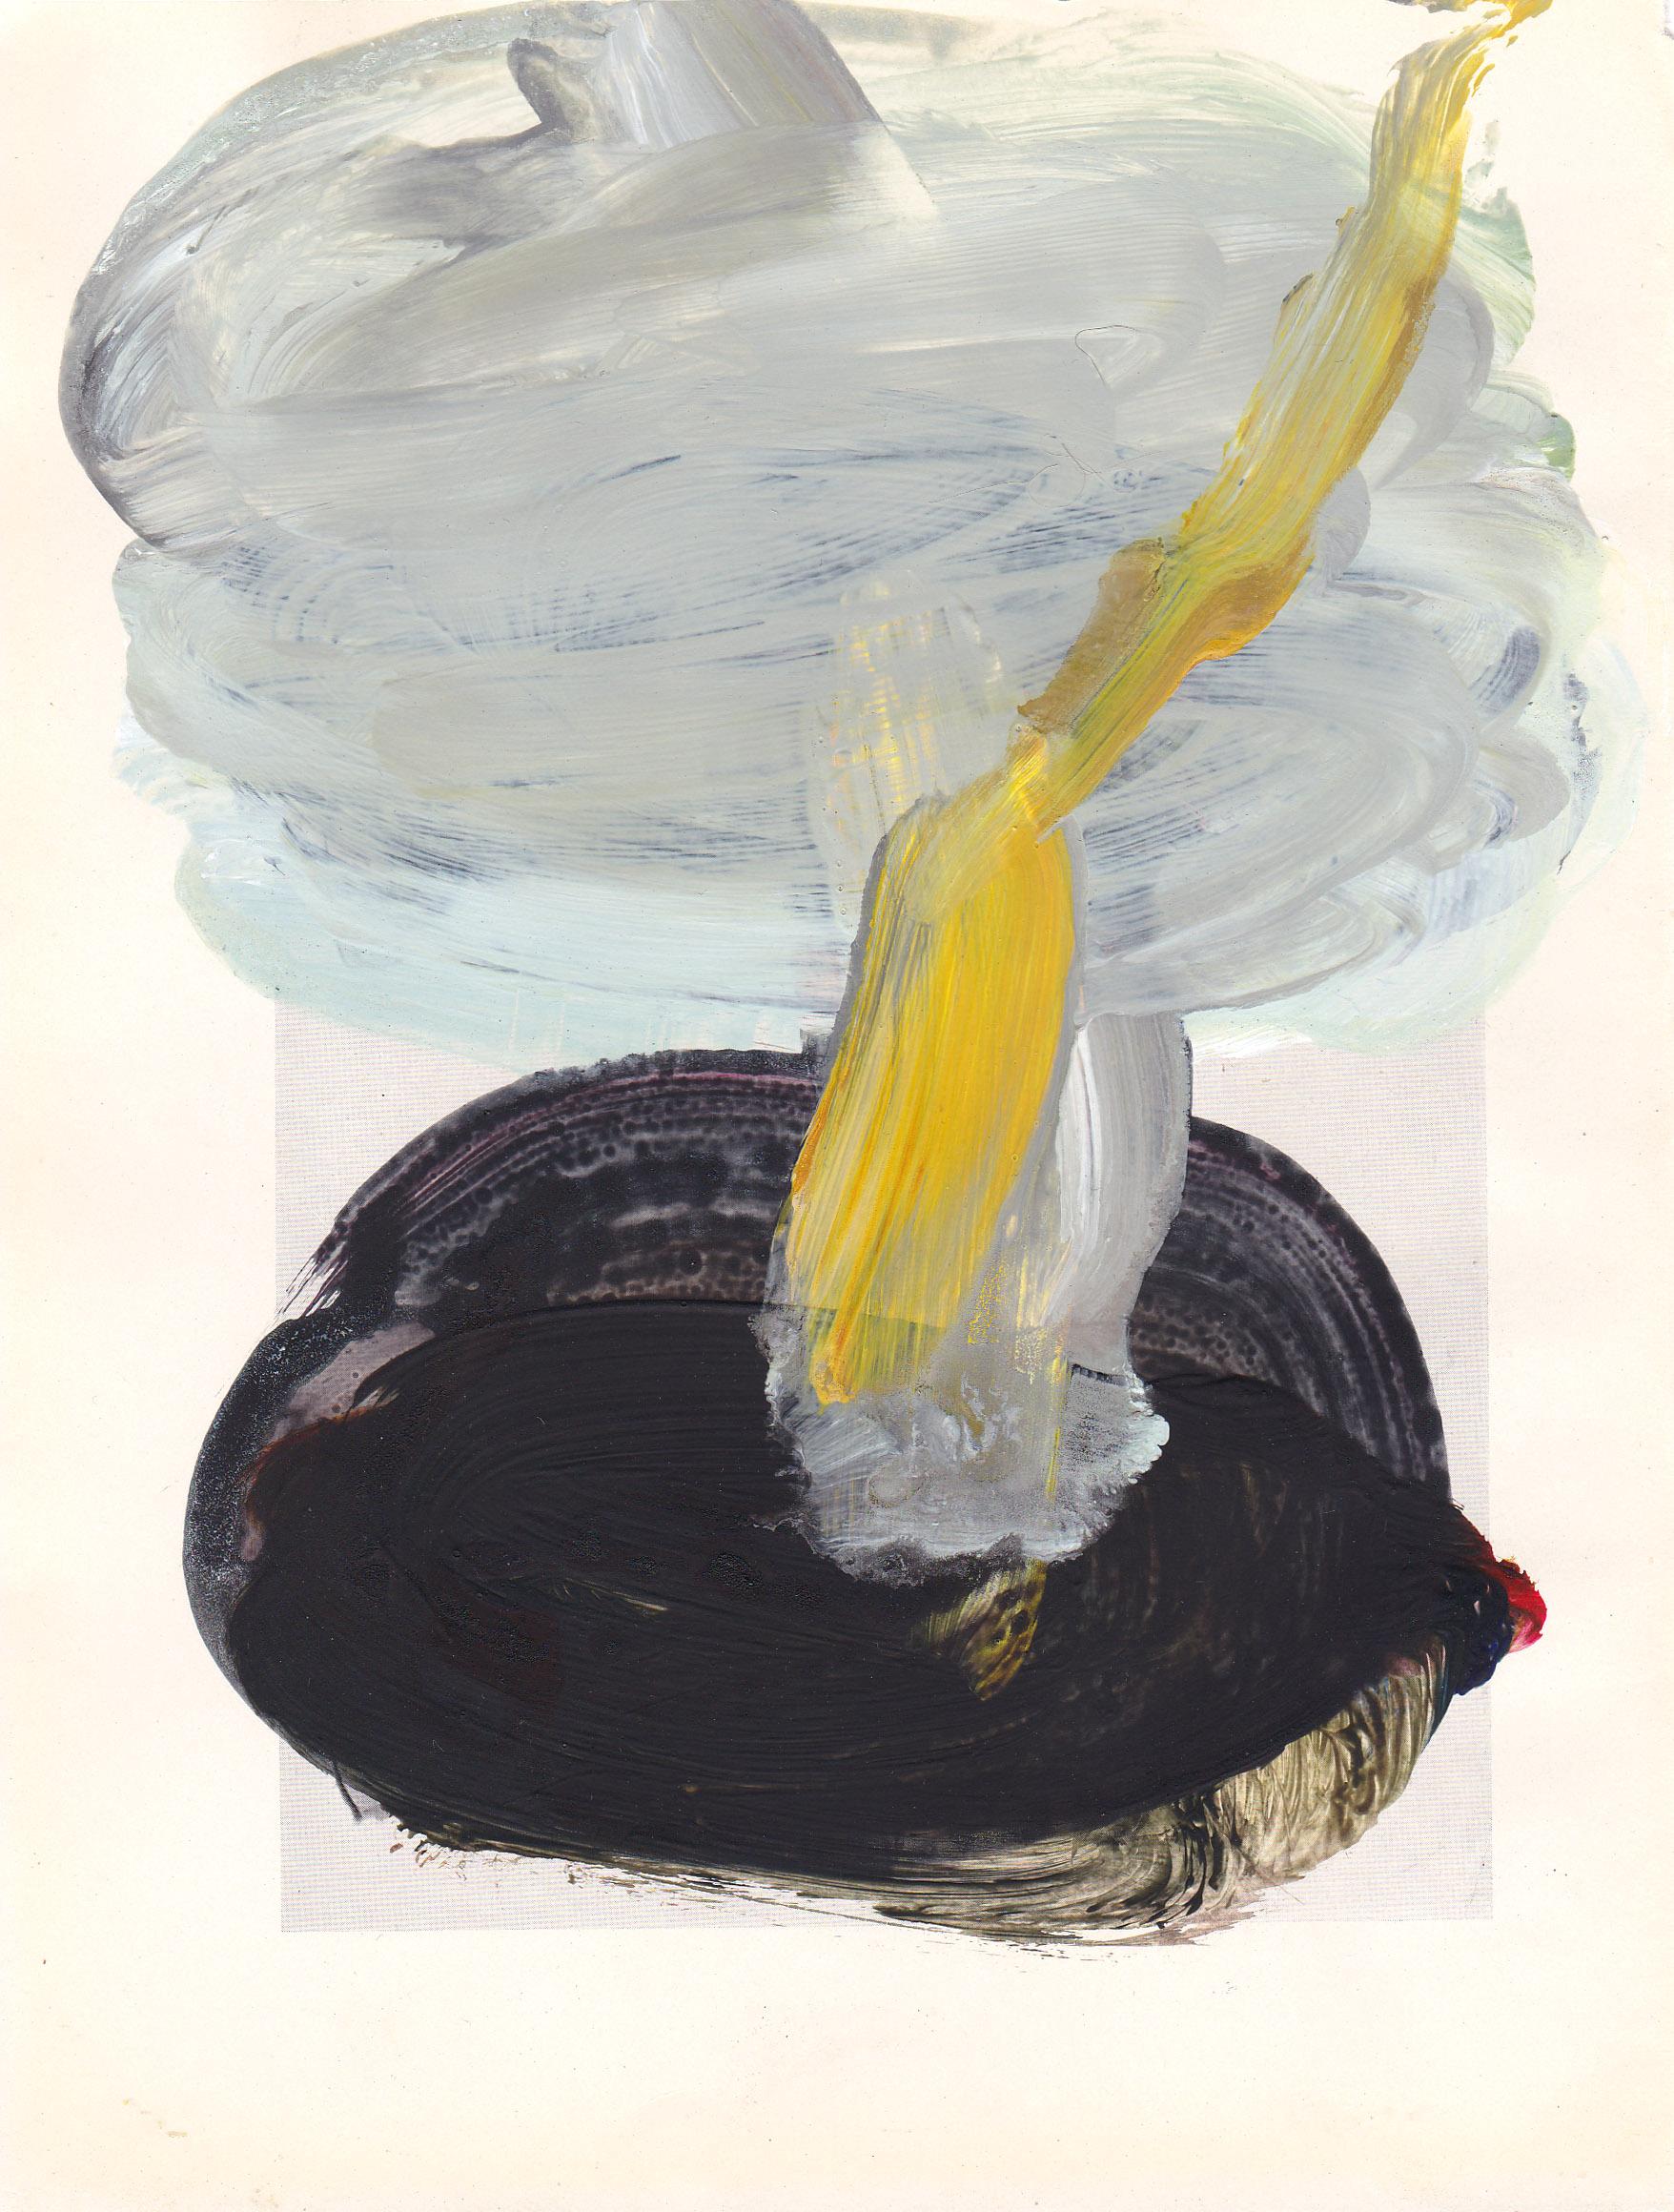 Caroline Pedler All In Time 15 x 21 cm  acrylic on paper  £425